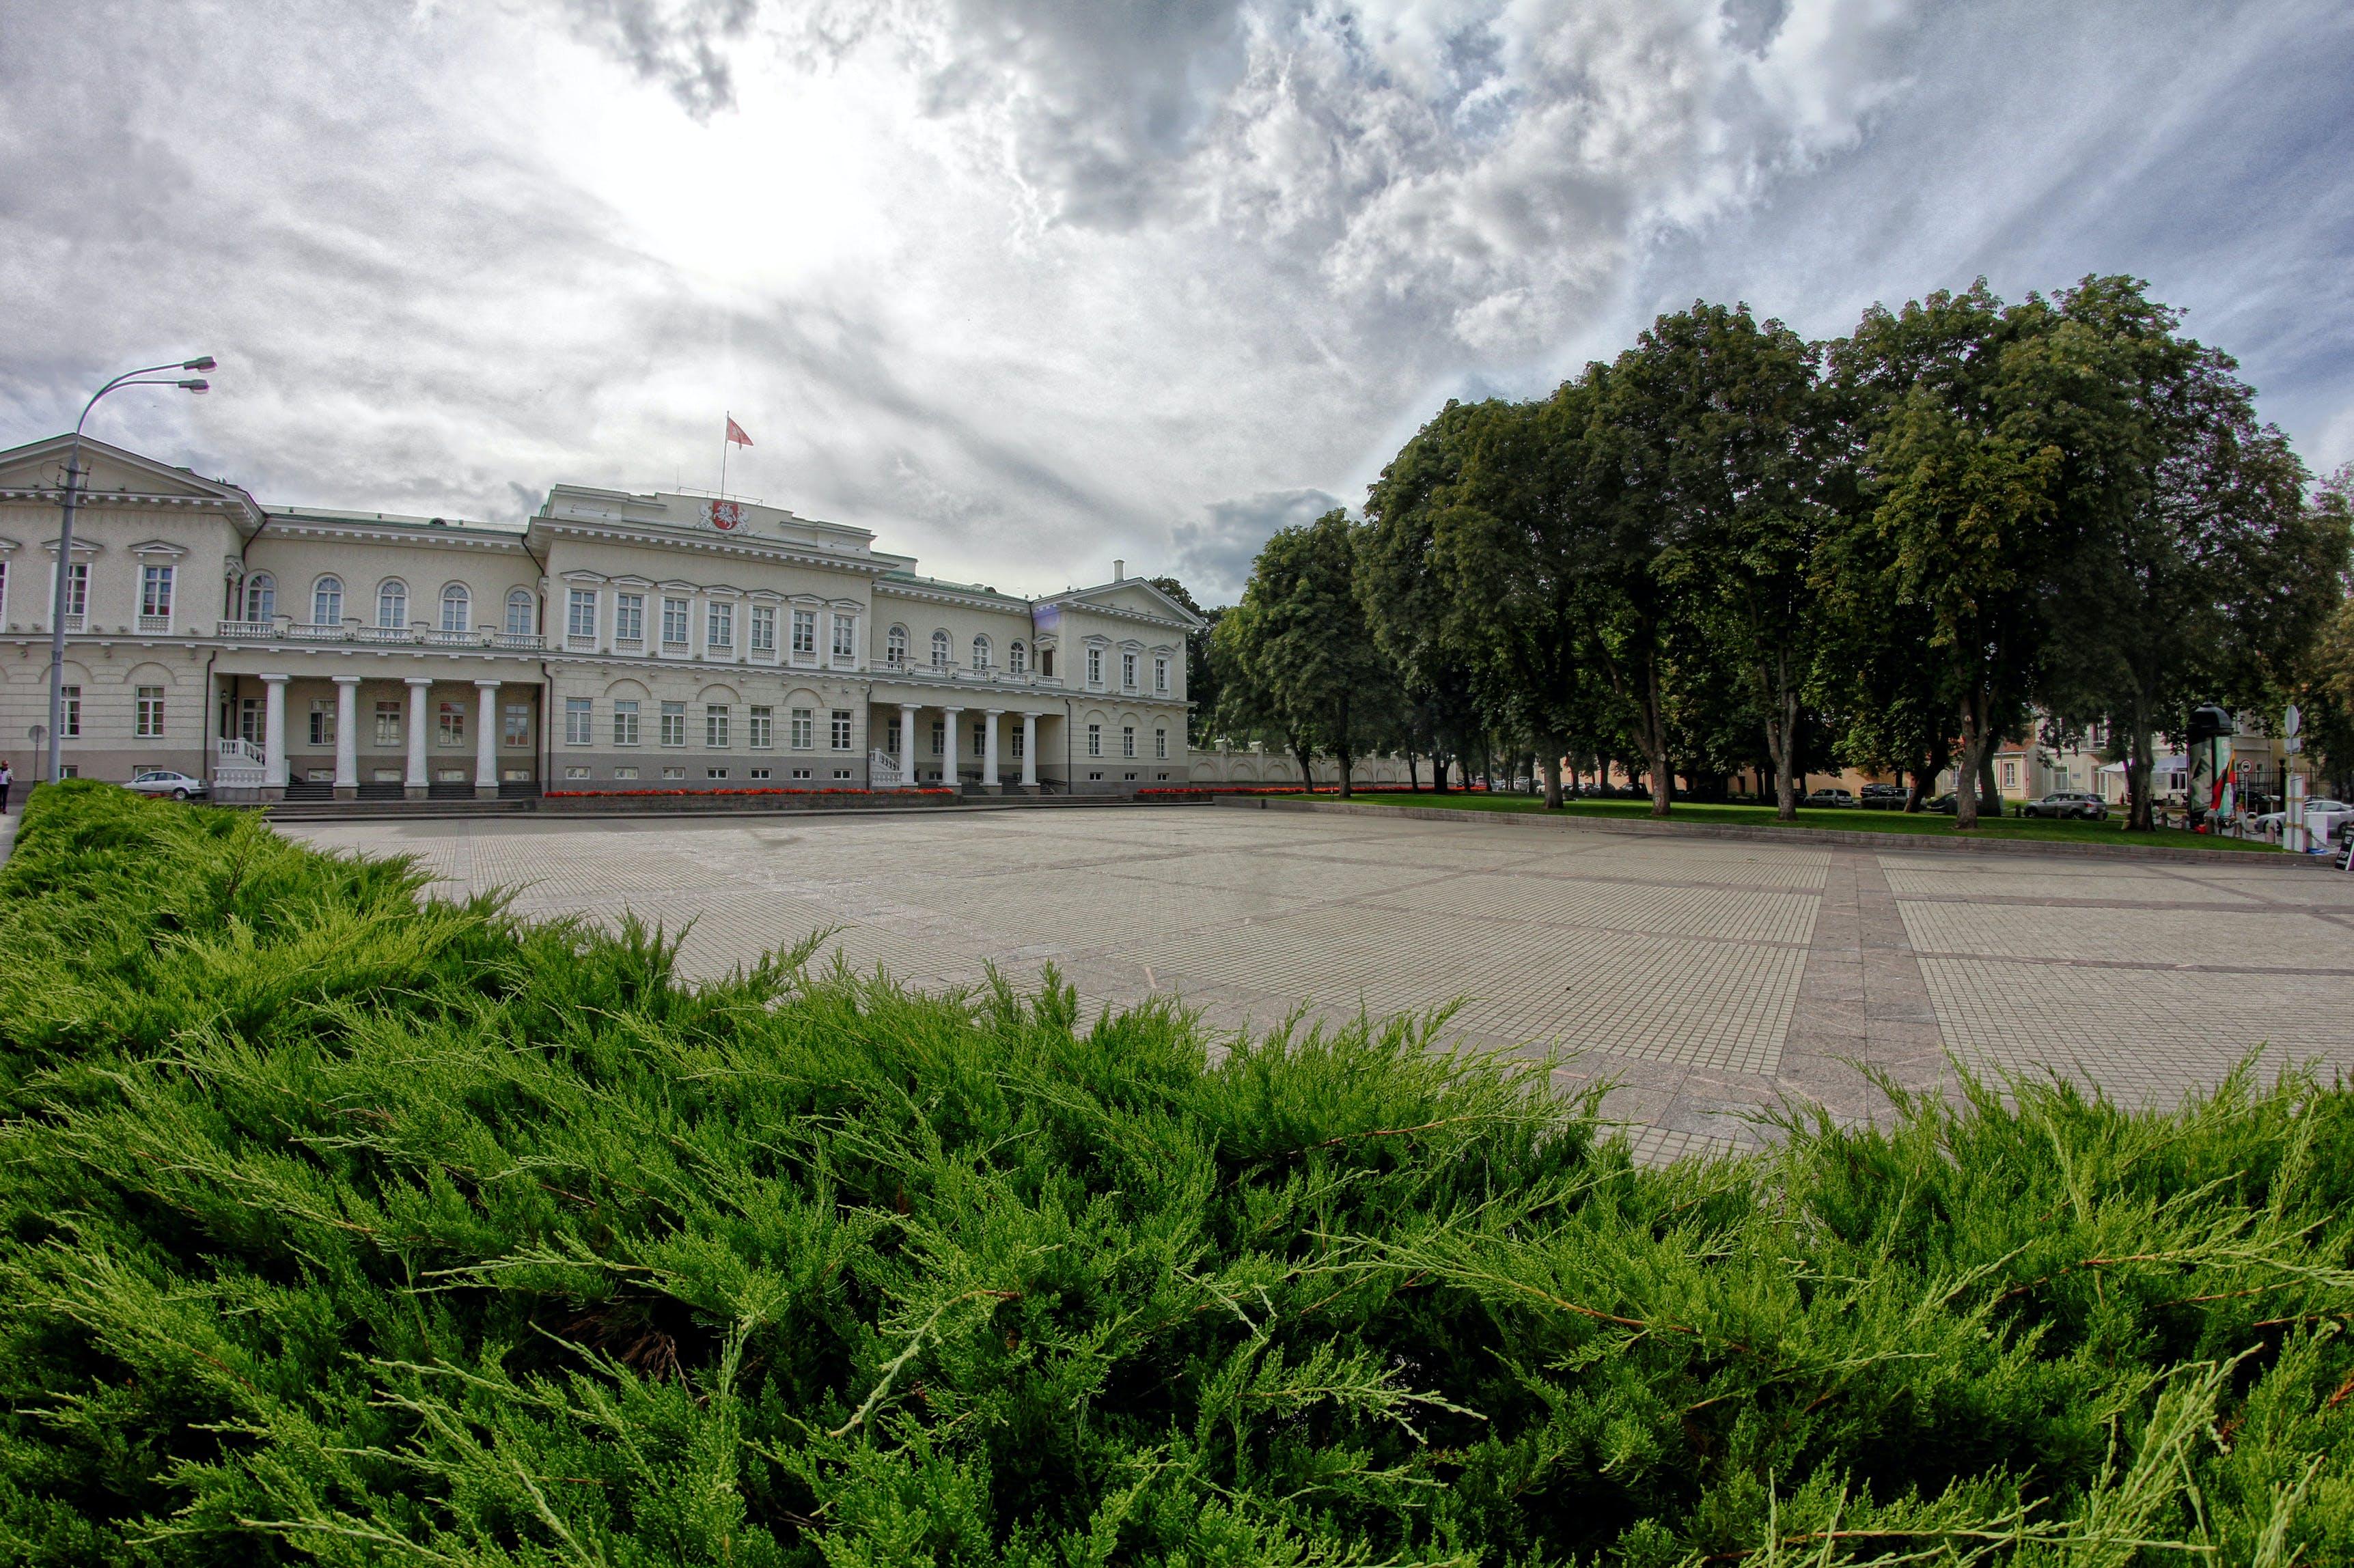 Free stock photo of Vilnius City Centre